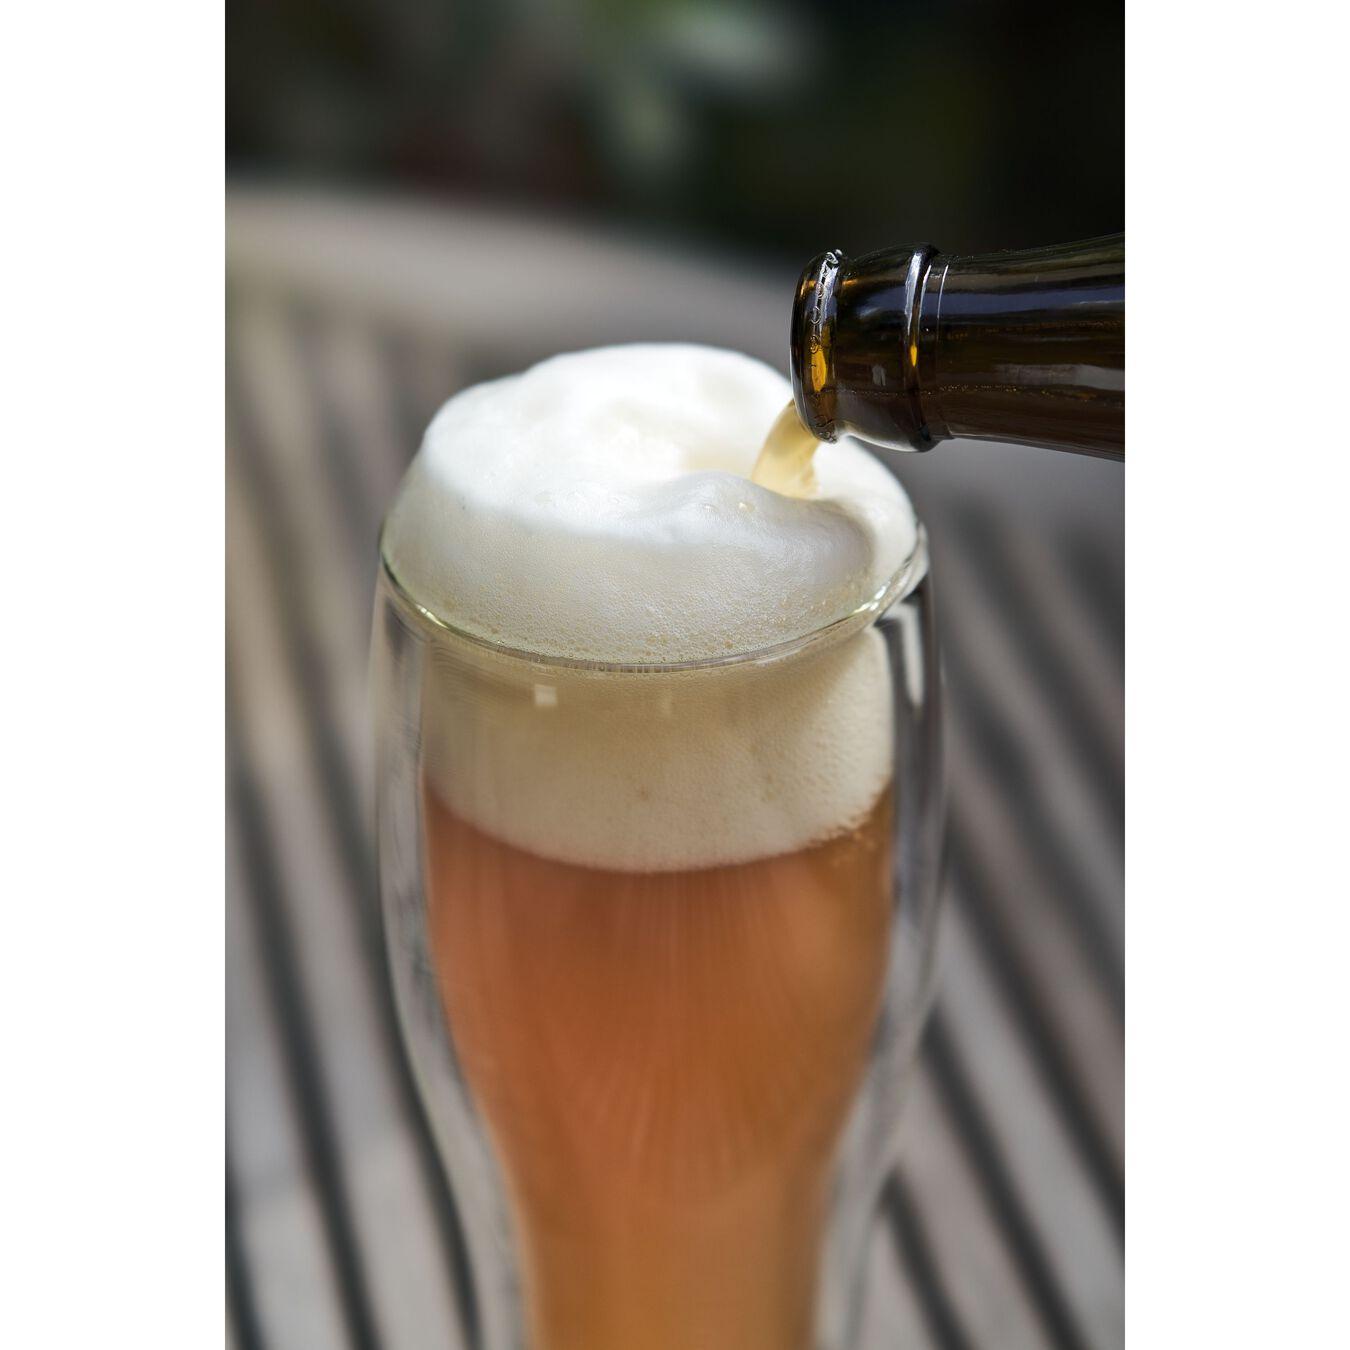 4 Piece Beer glass set,,large 7